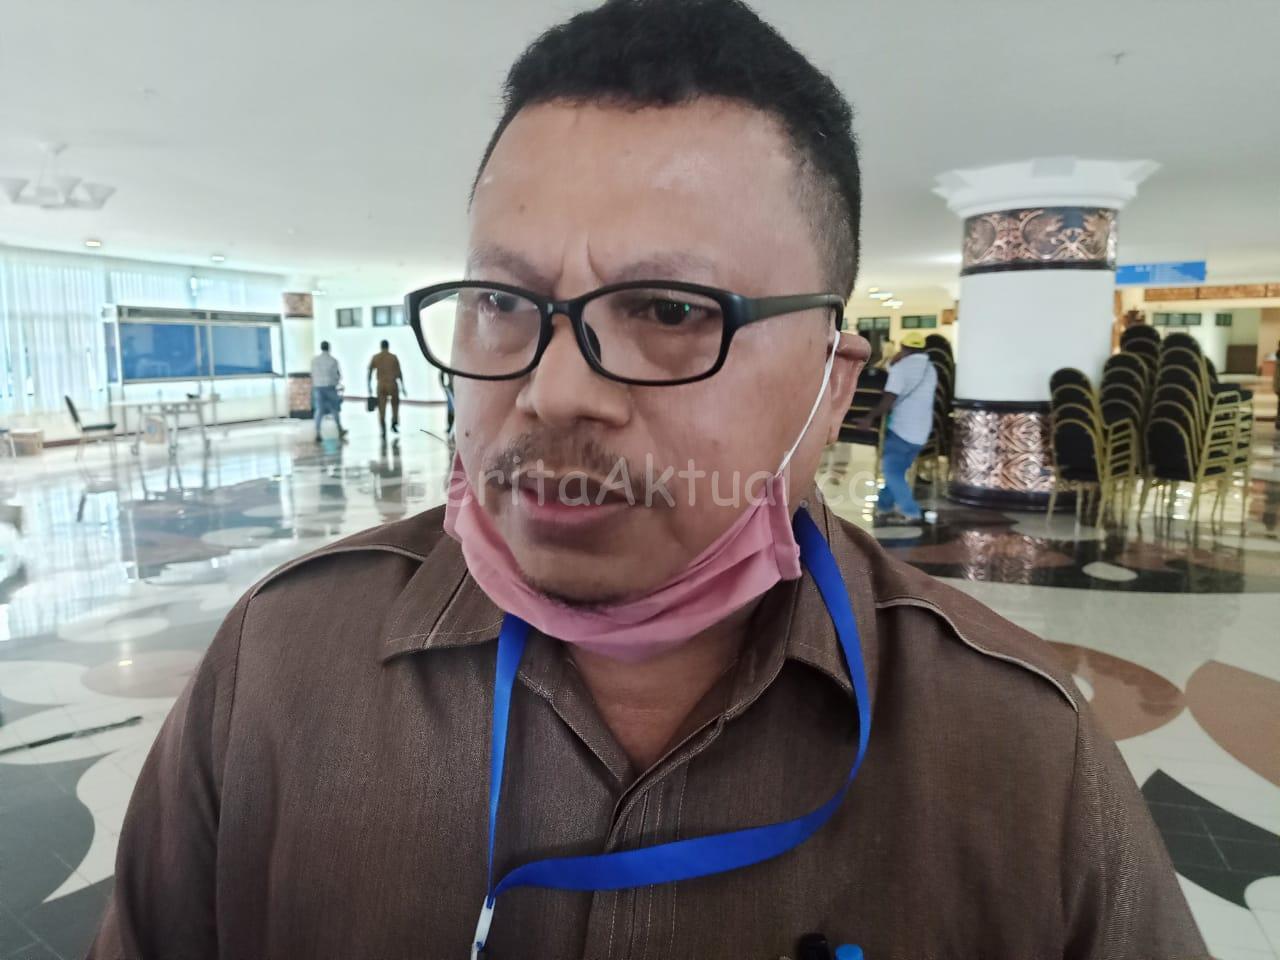 Hampir Sebulan Belum Ada Yang Klaim Sebagai Pencipta Lagu Tanah Papua 2 IMG 20200610 WA0023